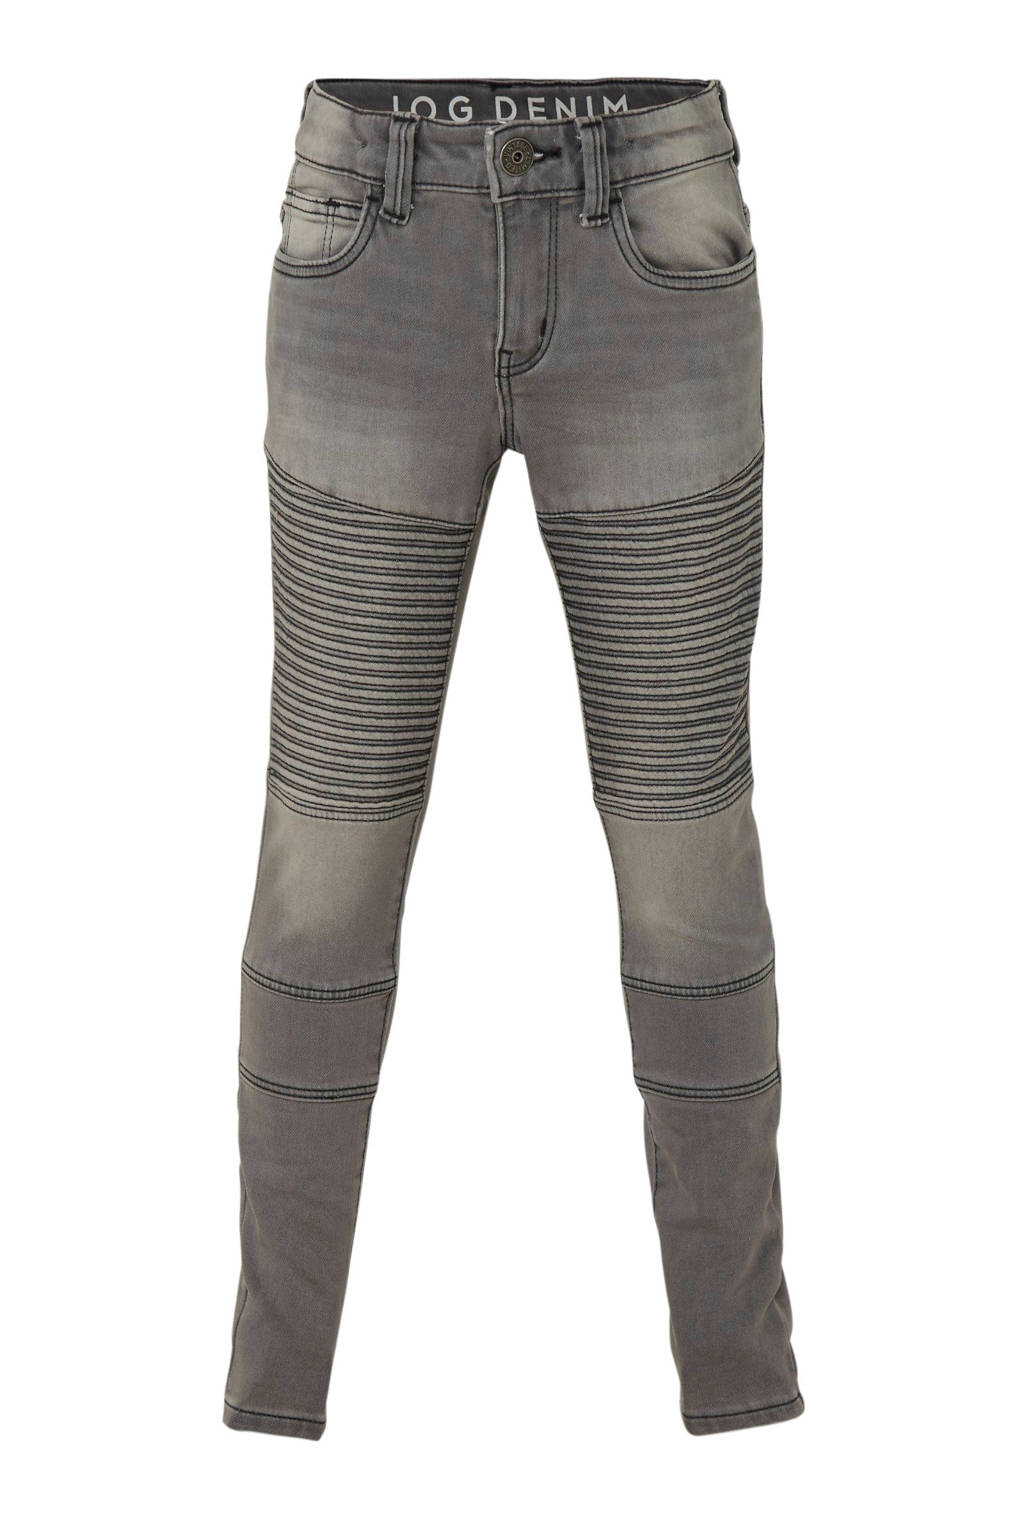 C&A The Denim slim fit jeans met textuur, Grijs